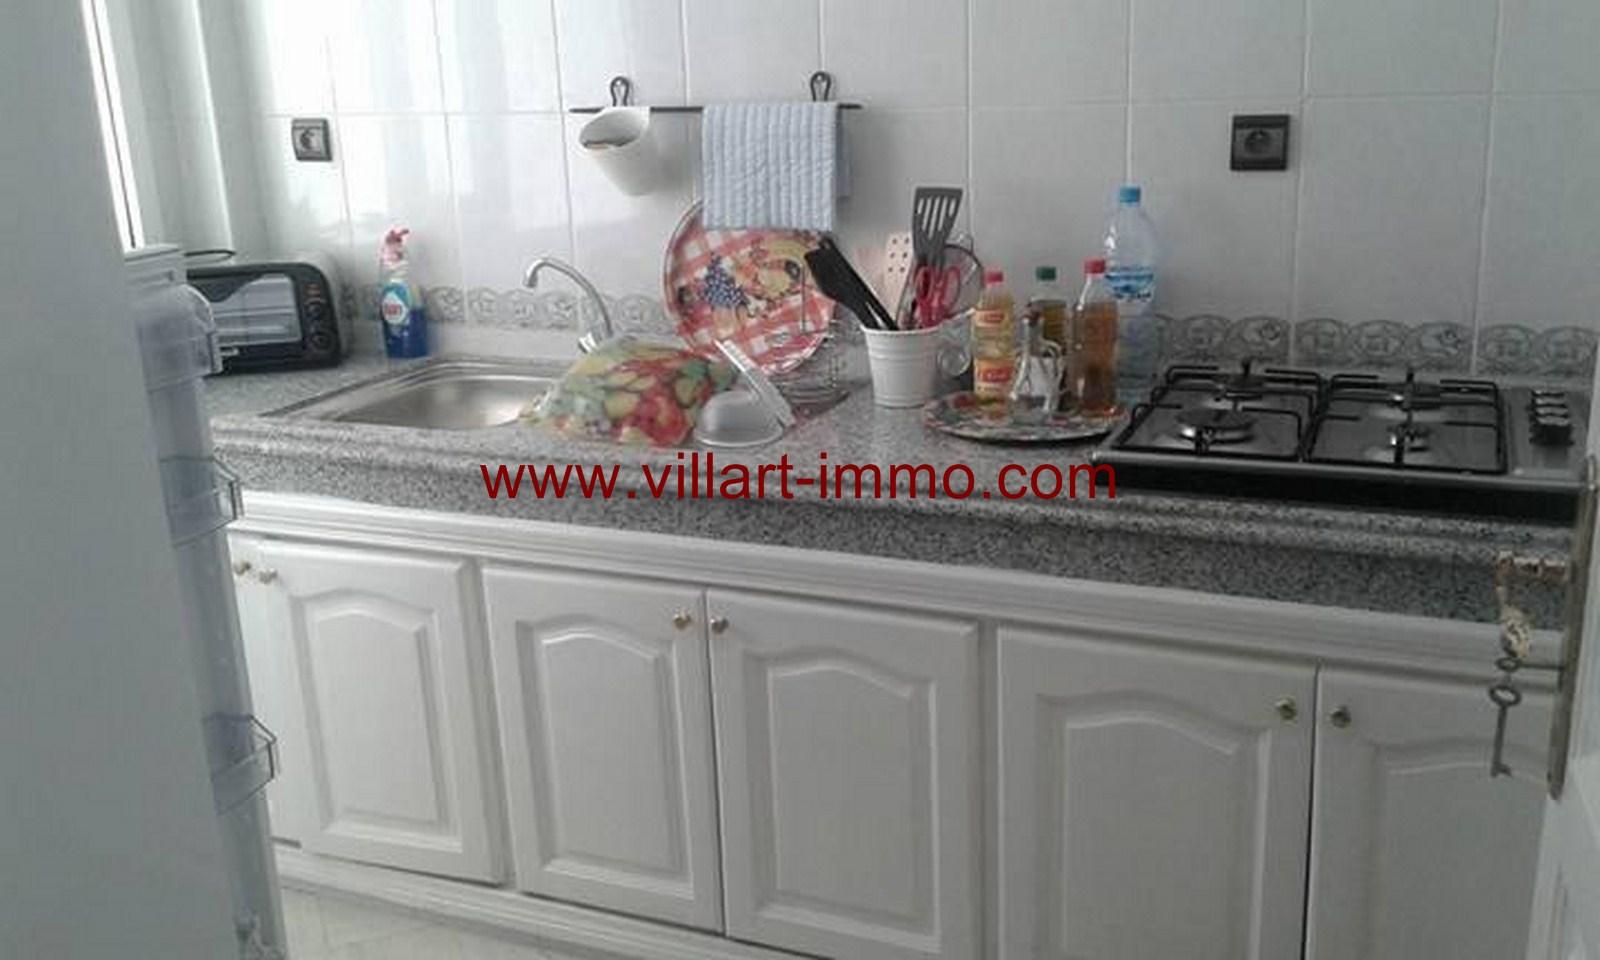 5-Vente-Appartement-Assilah-Autres-Cuisine-VA62-Villart Immo